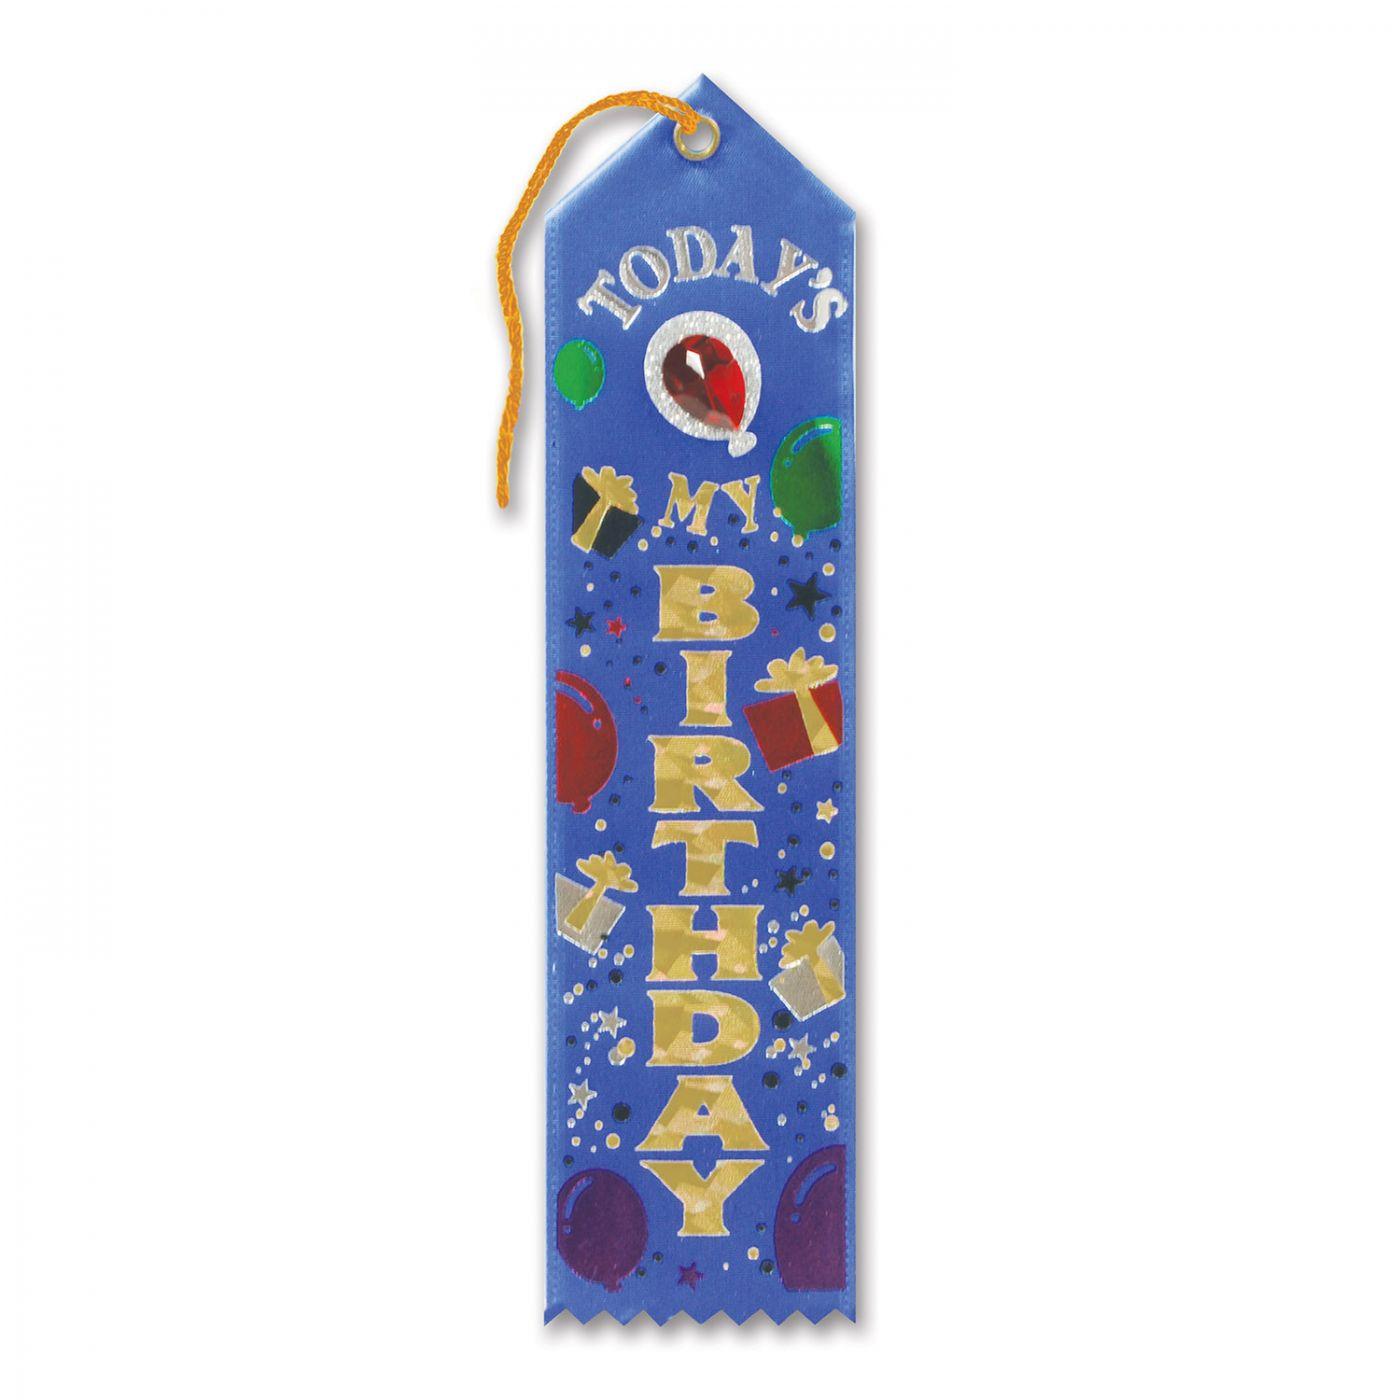 Today's My Birthday Jeweled Ribbon (6) image